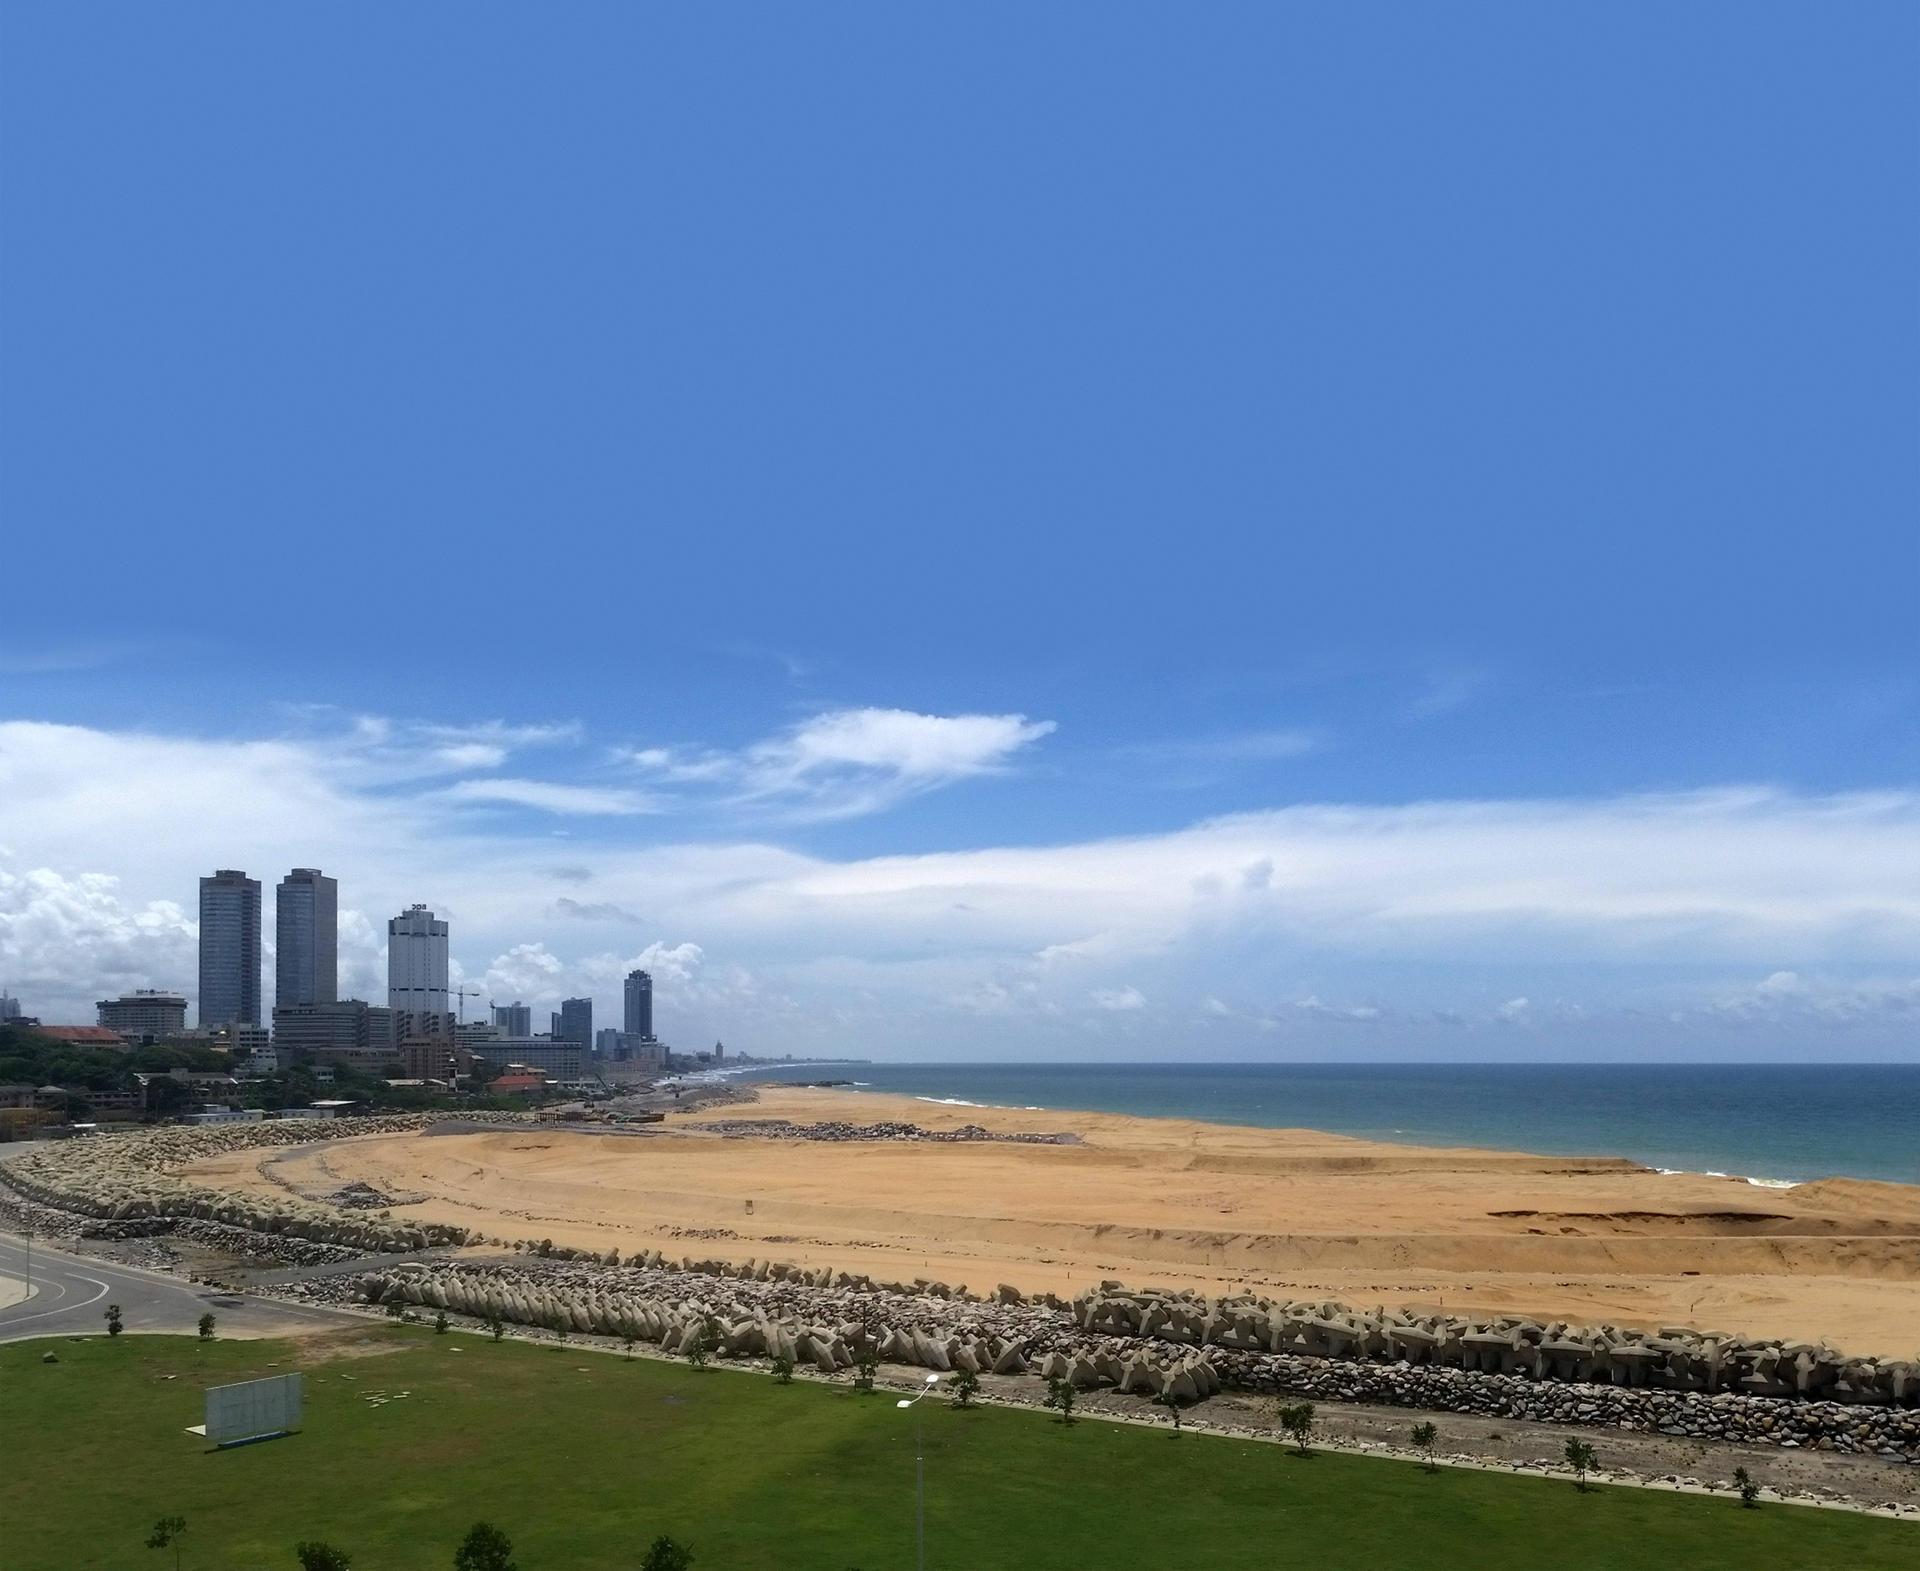 Shipping Lines In Sri Lanka Fabbcfecafa